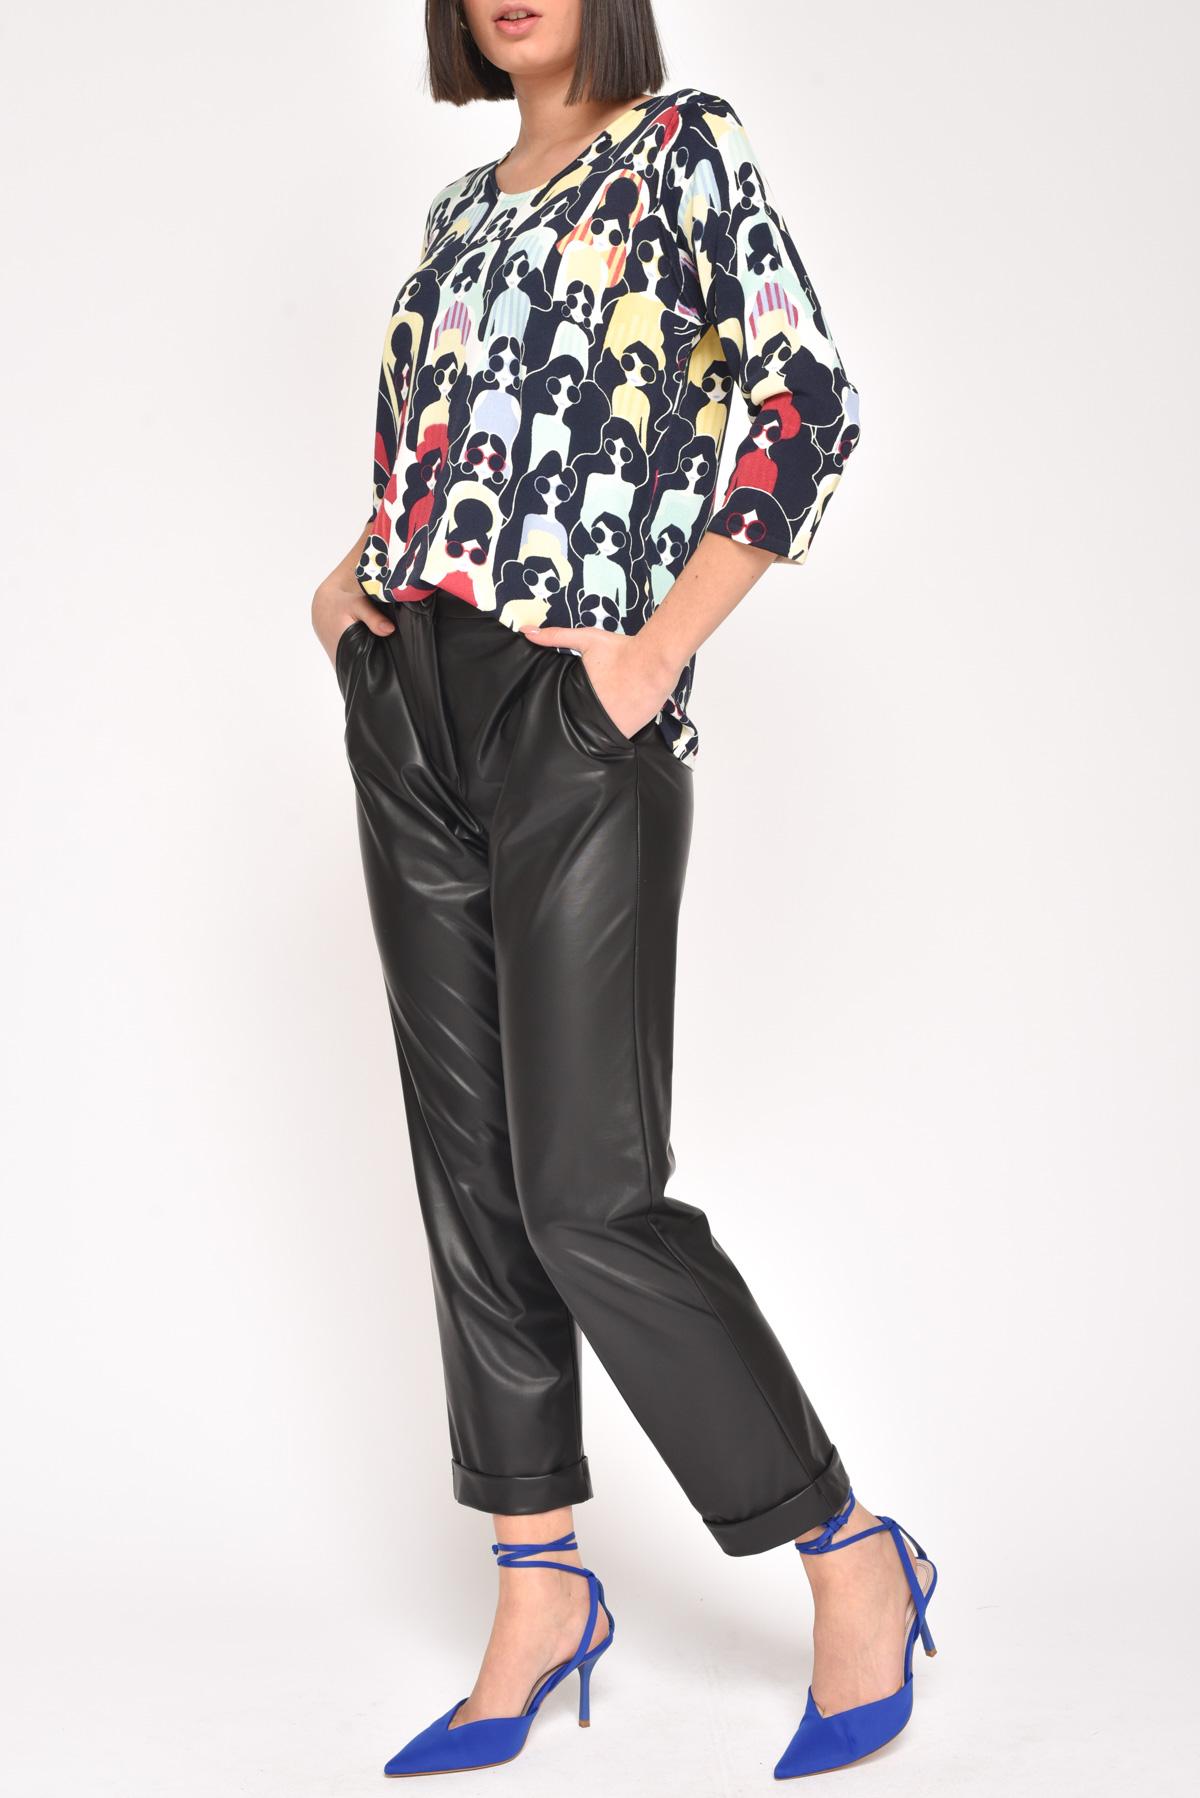 PANTALONE SPORTY CHIC IN ECOPELLE for women - BLACK - Paquito Pronto Moda Shop Online